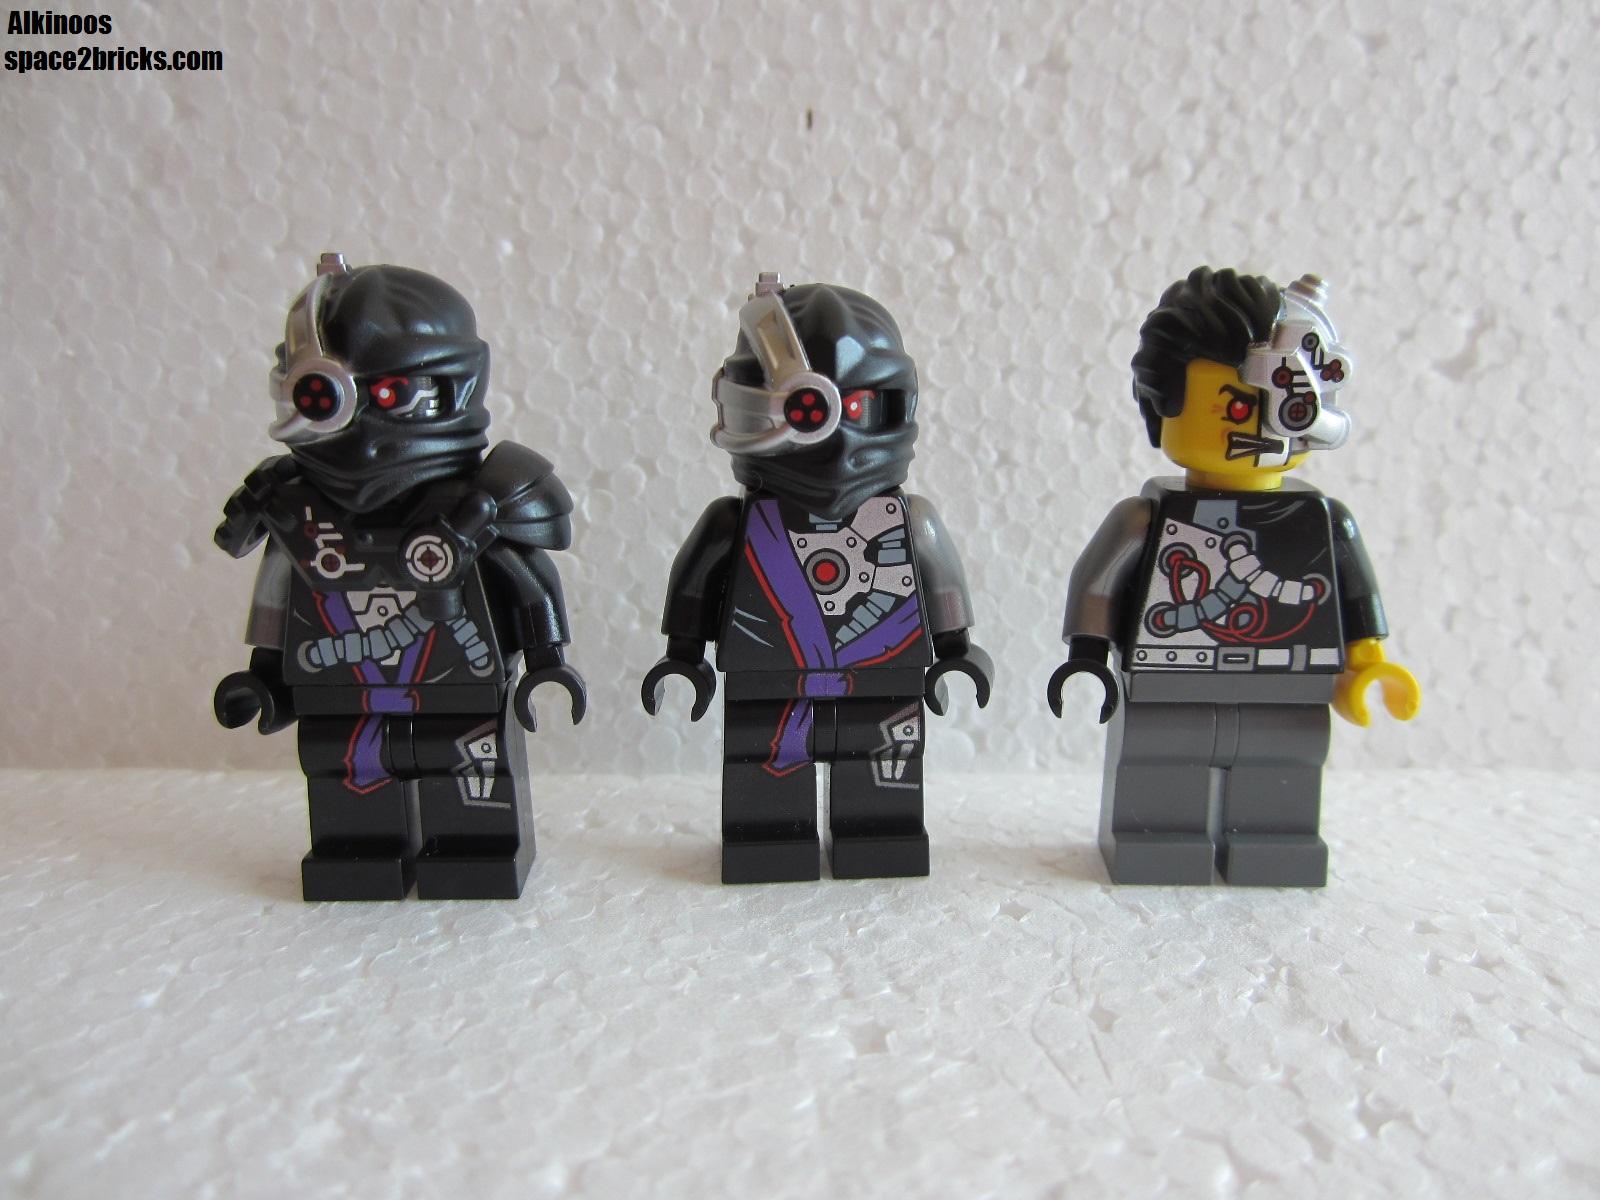 lego ninjago les cyborgs lego r by alkinoos. Black Bedroom Furniture Sets. Home Design Ideas